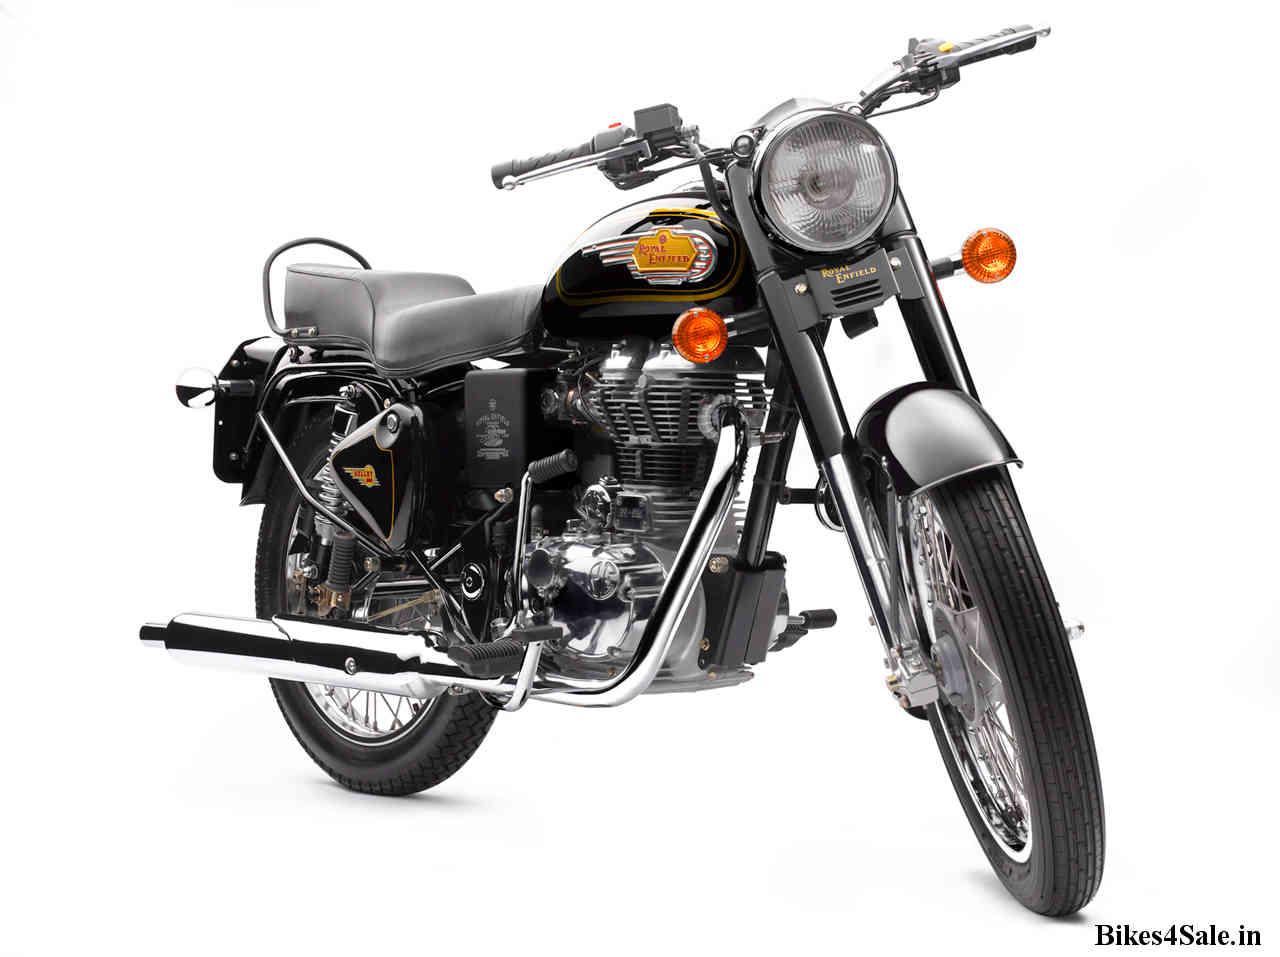 Royal Enfield Bullet 500 Wallpapers Bikes4sale